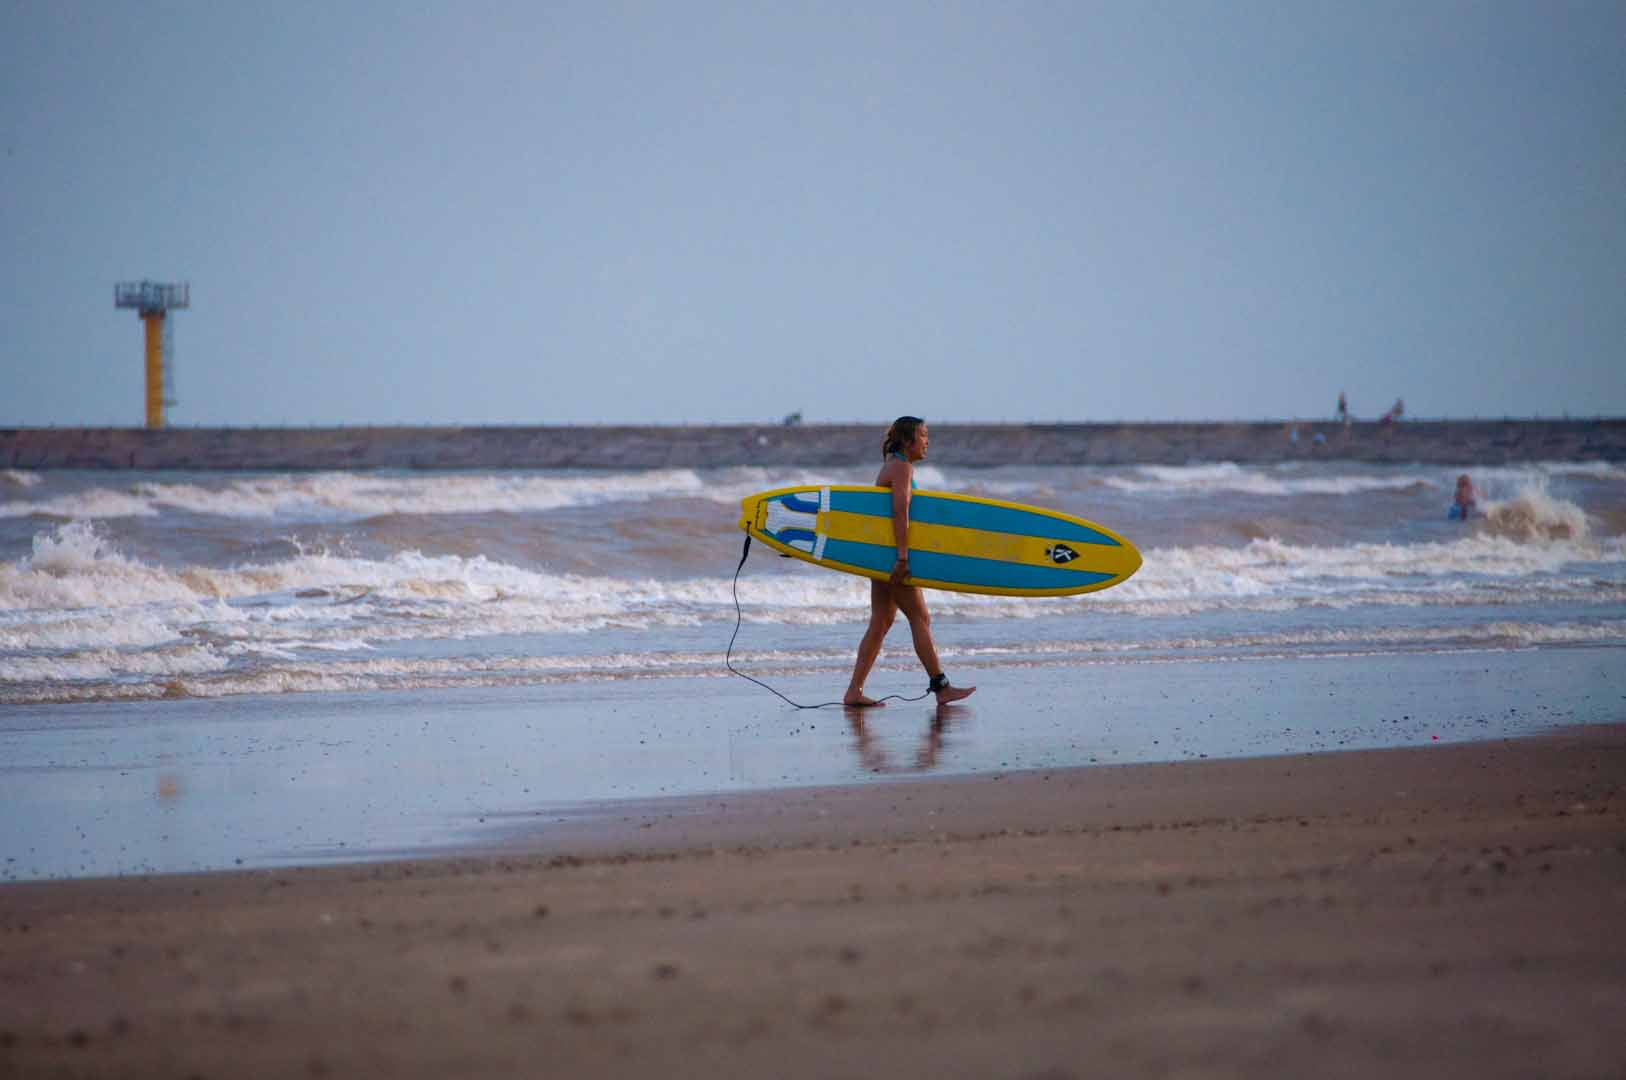 SurfsideJuly2_20150702_248